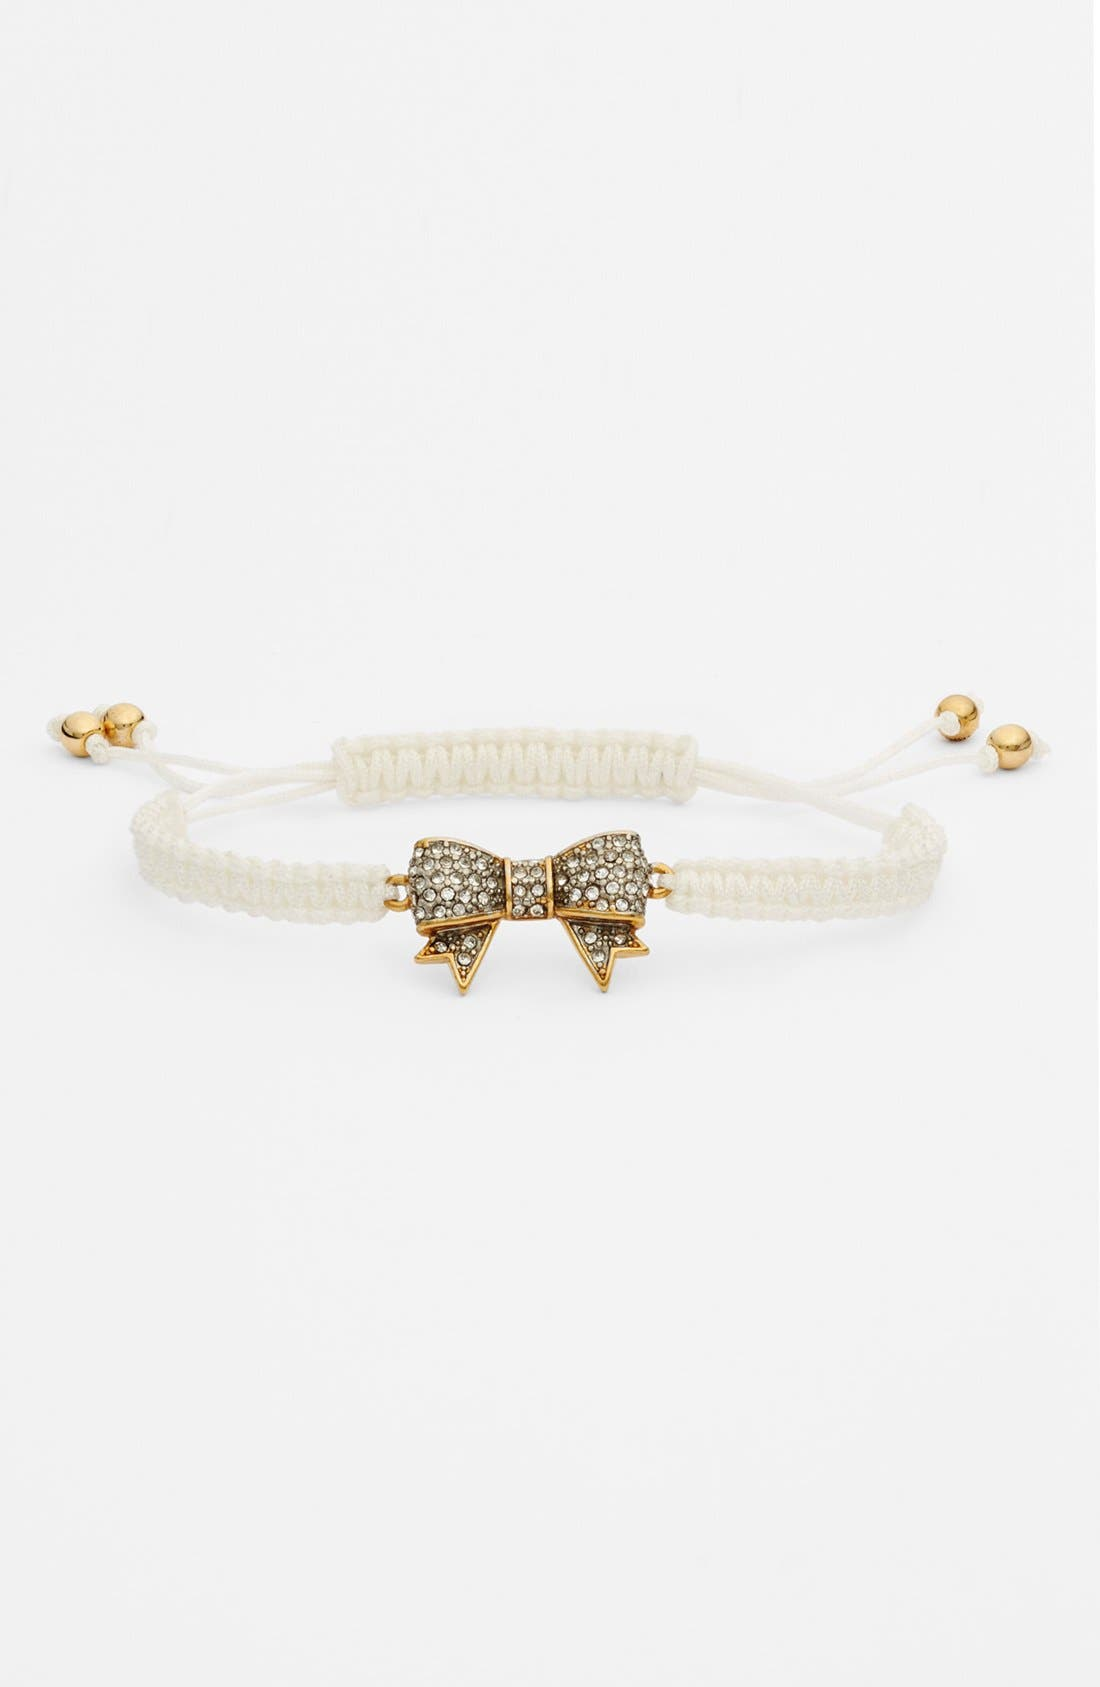 Alternate Image 1 Selected - Juicy Couture 'Jewelry Box Treasures' Pavé Bow Macramé Bracelet